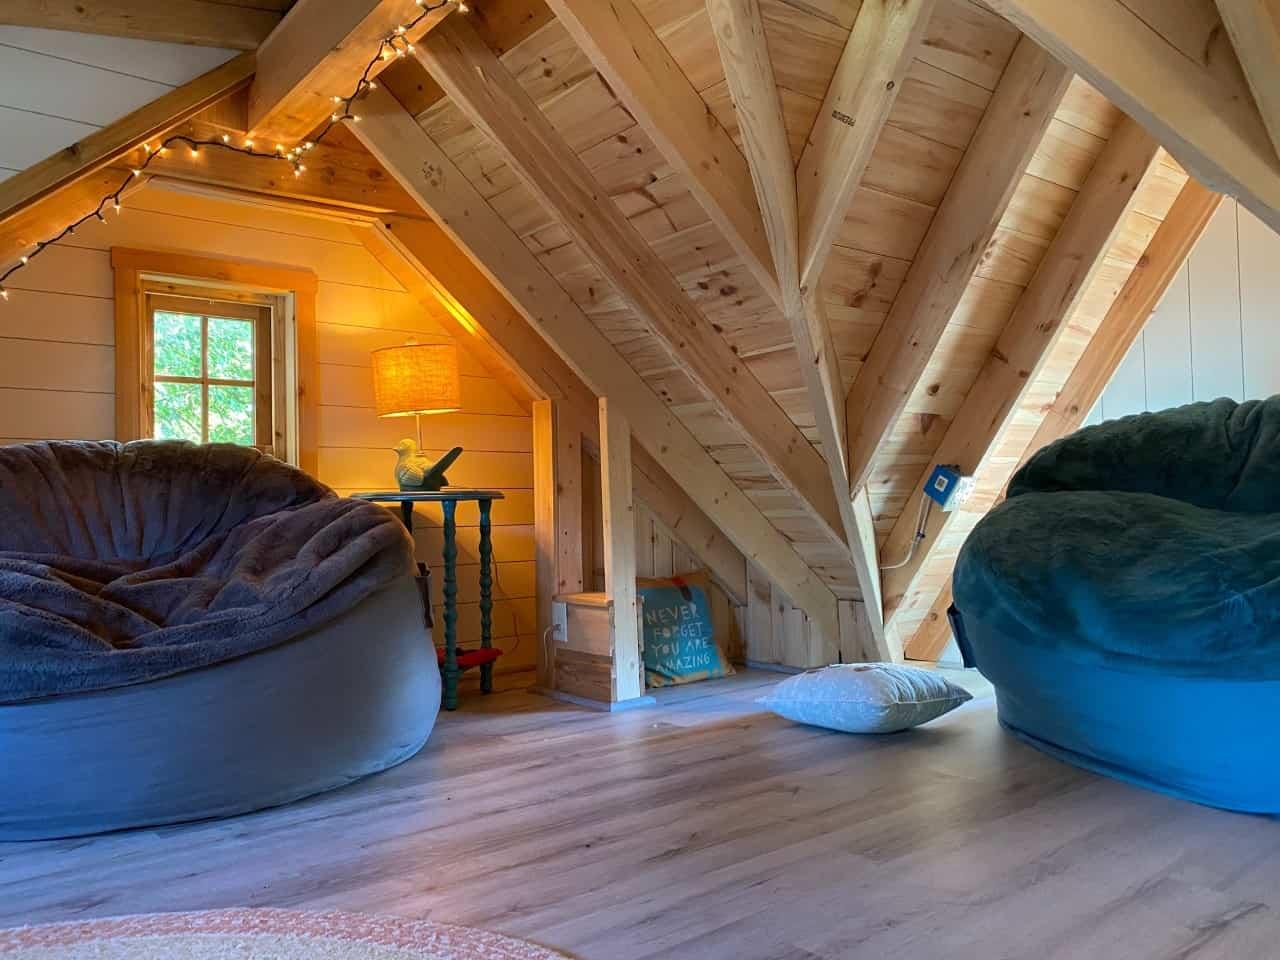 Bala Bunkie Loft Space - Summerwood Products